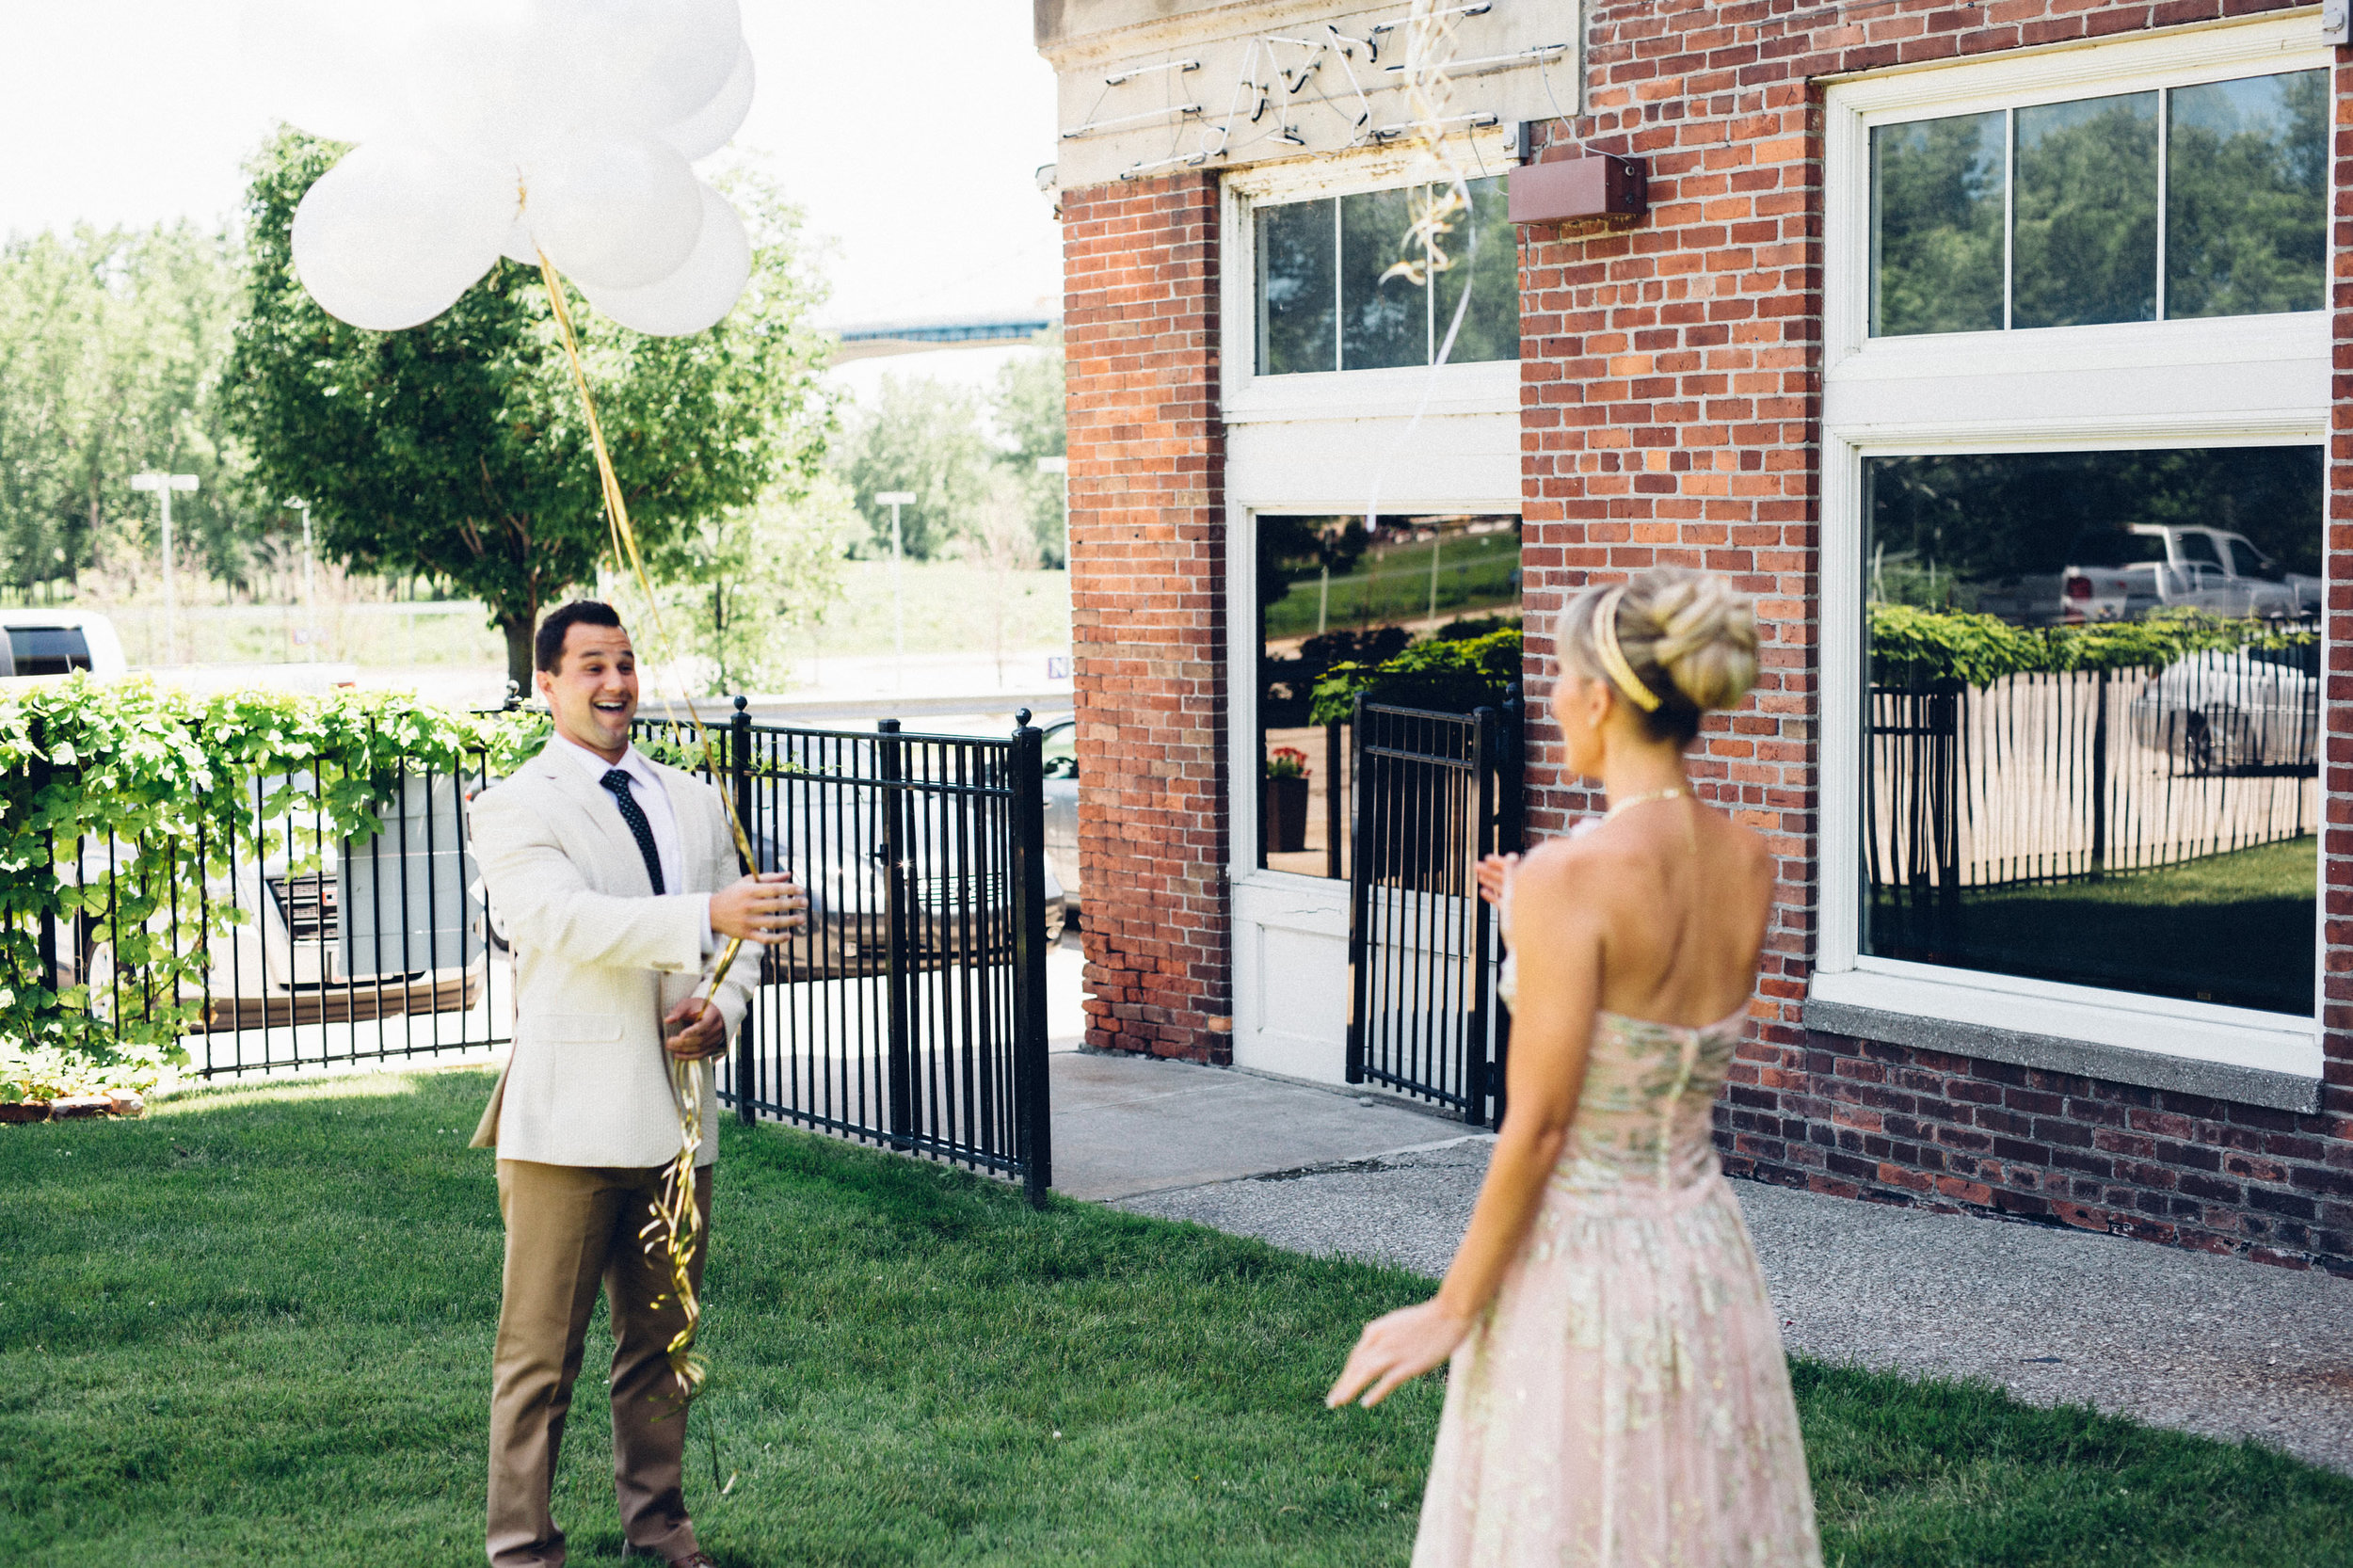 Stress Free Wedding Day Blog and Inspiration